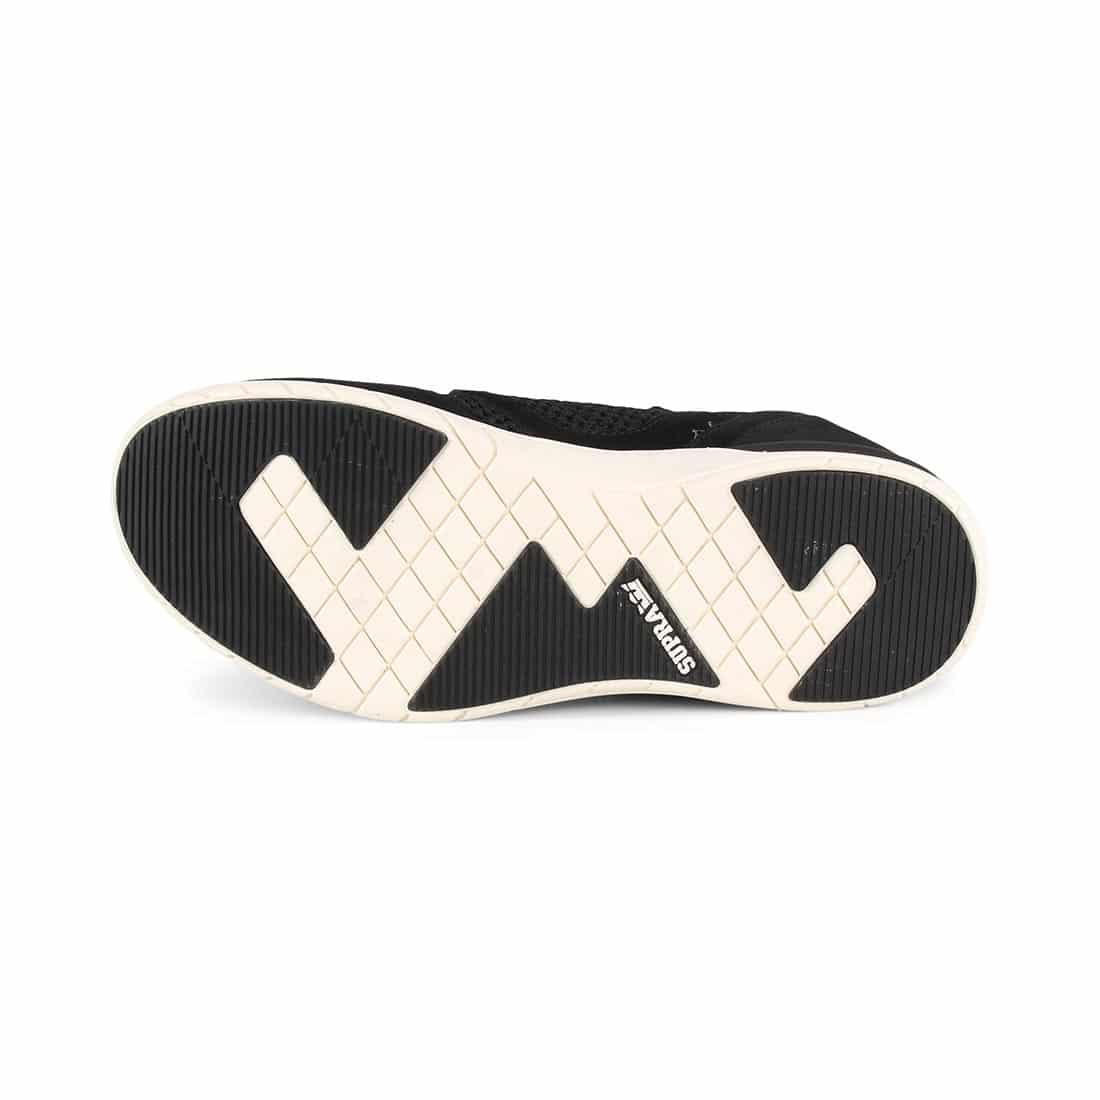 Supra Method Shoes - Black / Off White